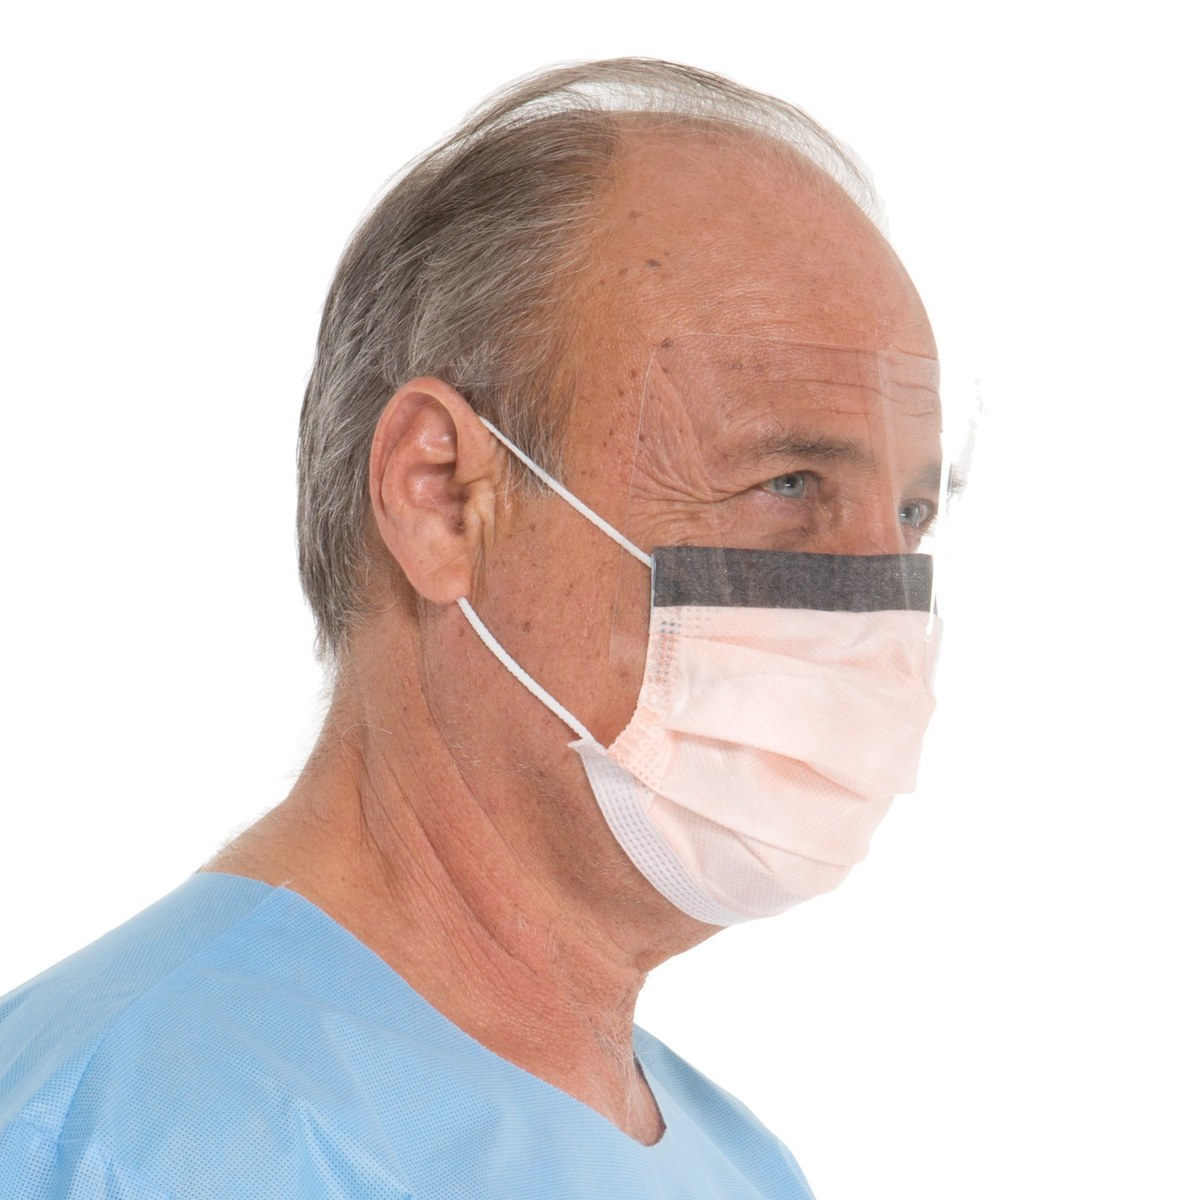 fluidshield surgical mask